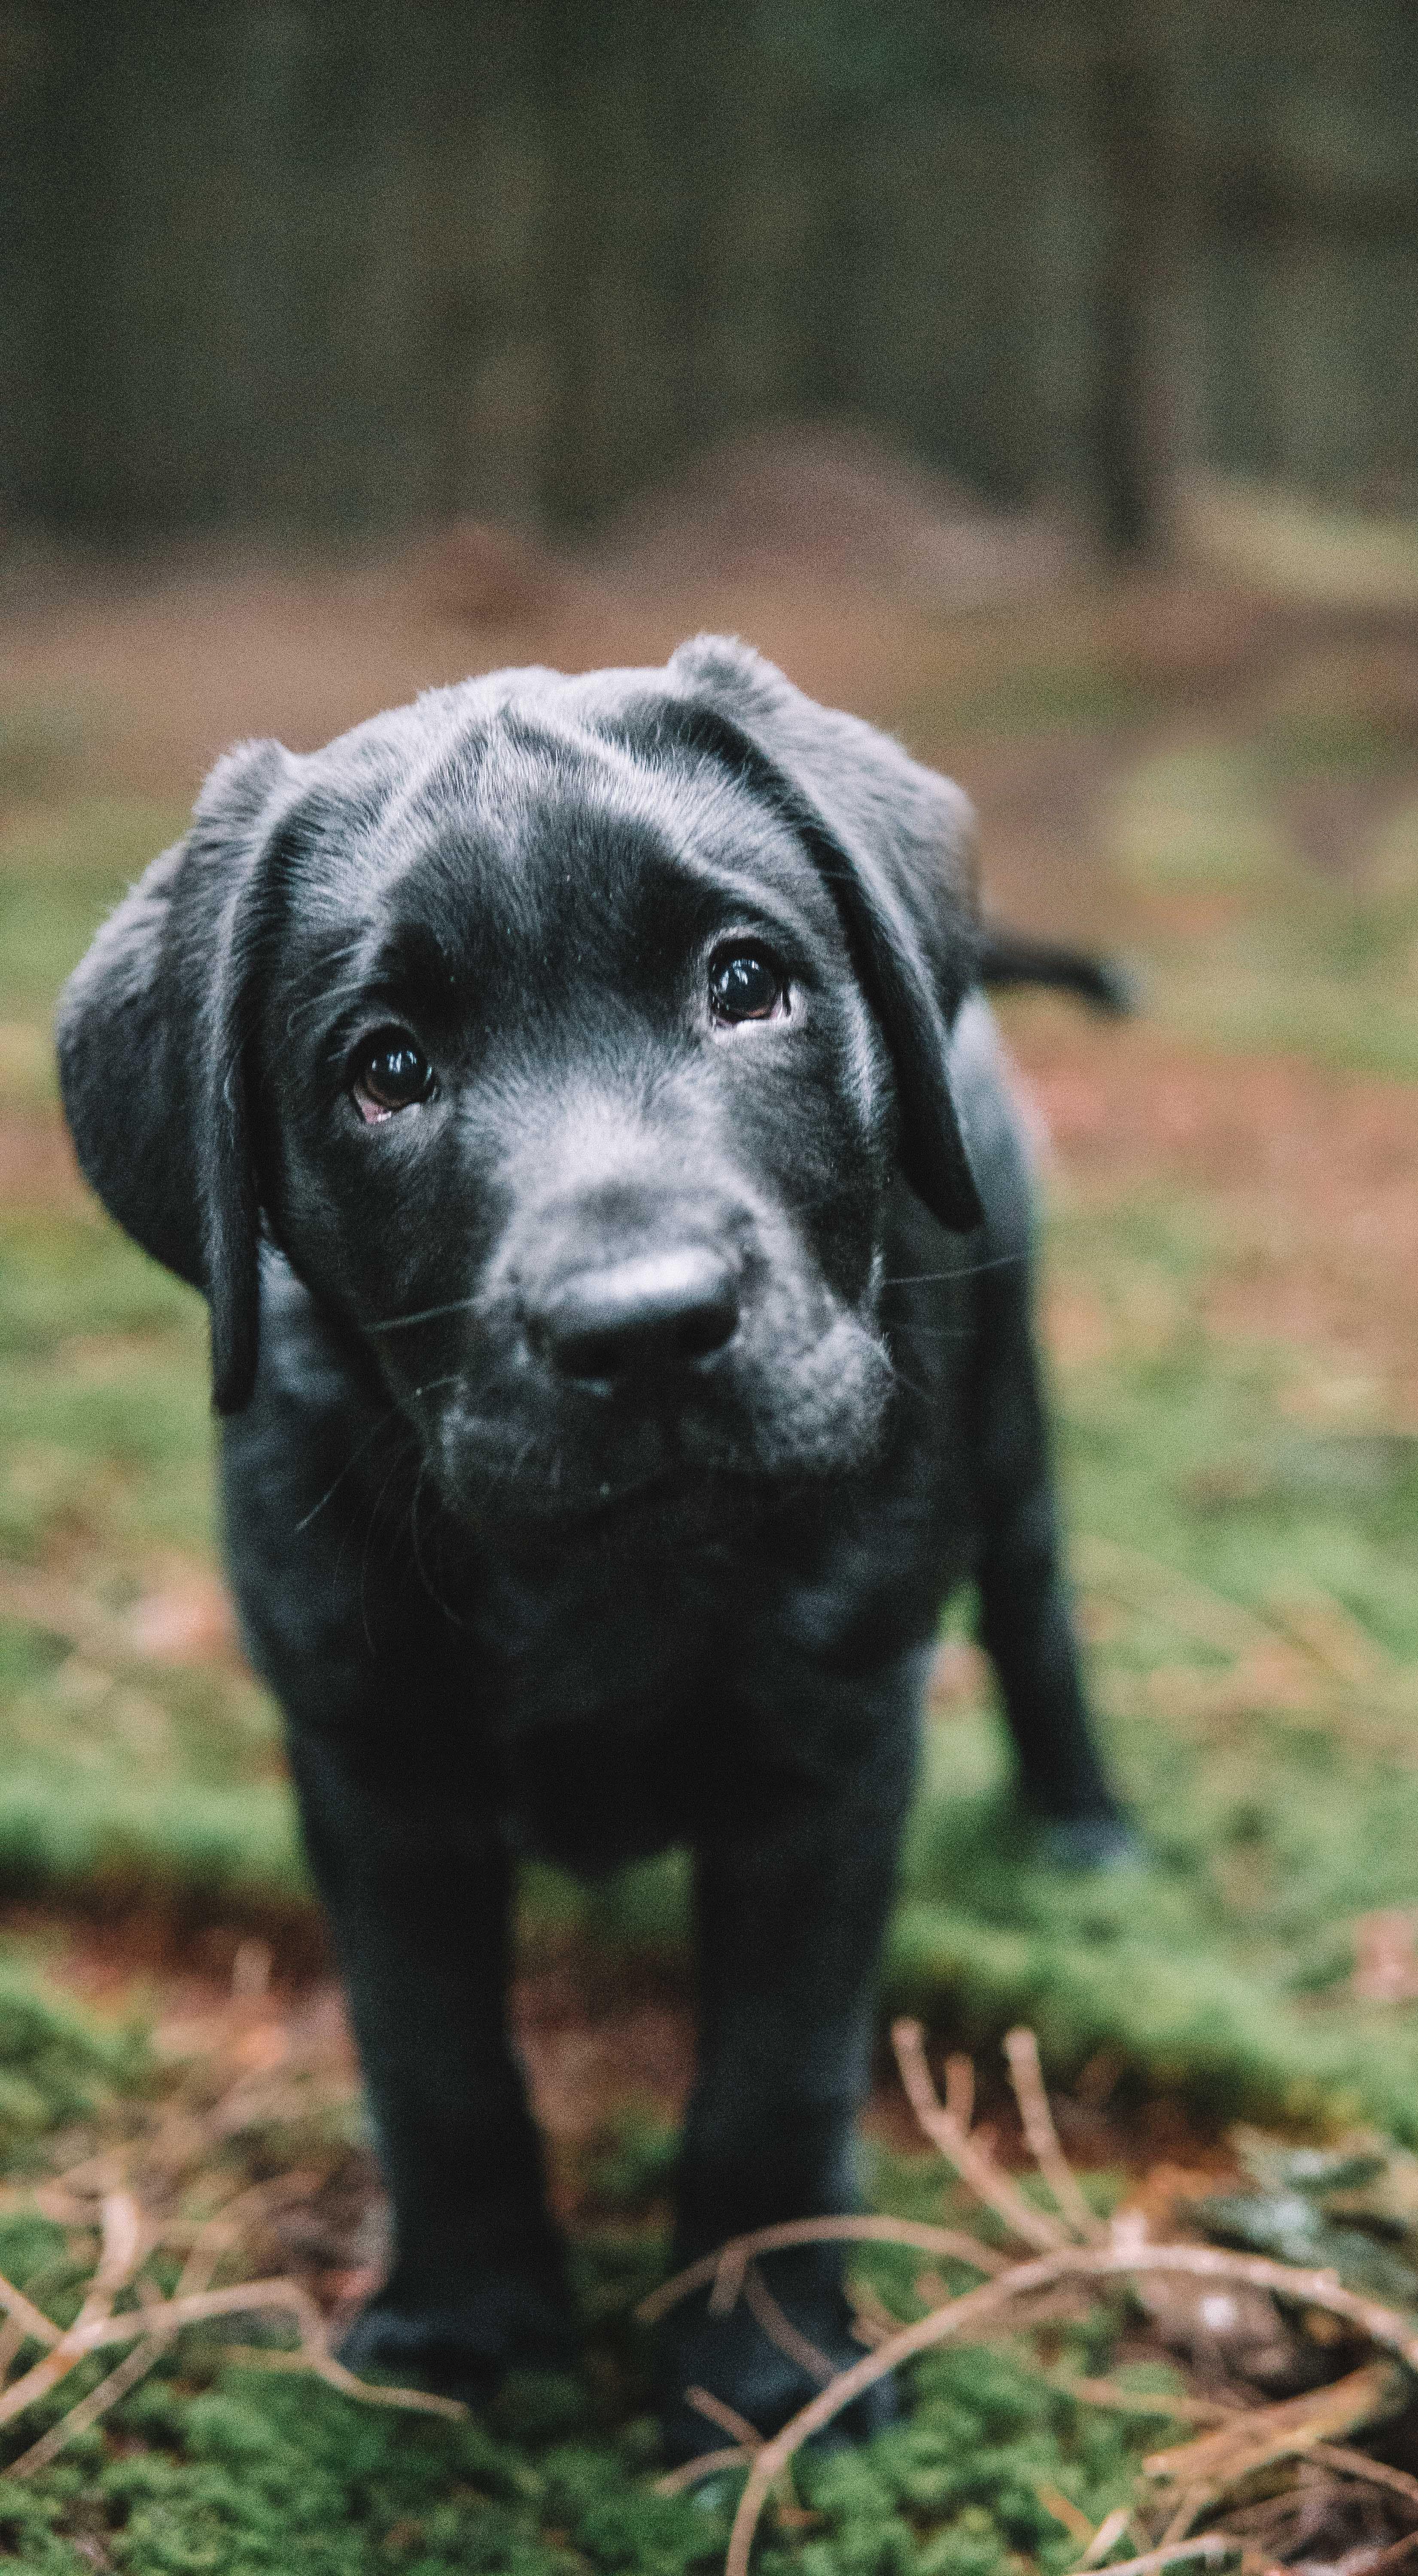 labradorpuppies labrador puppy photoshoot